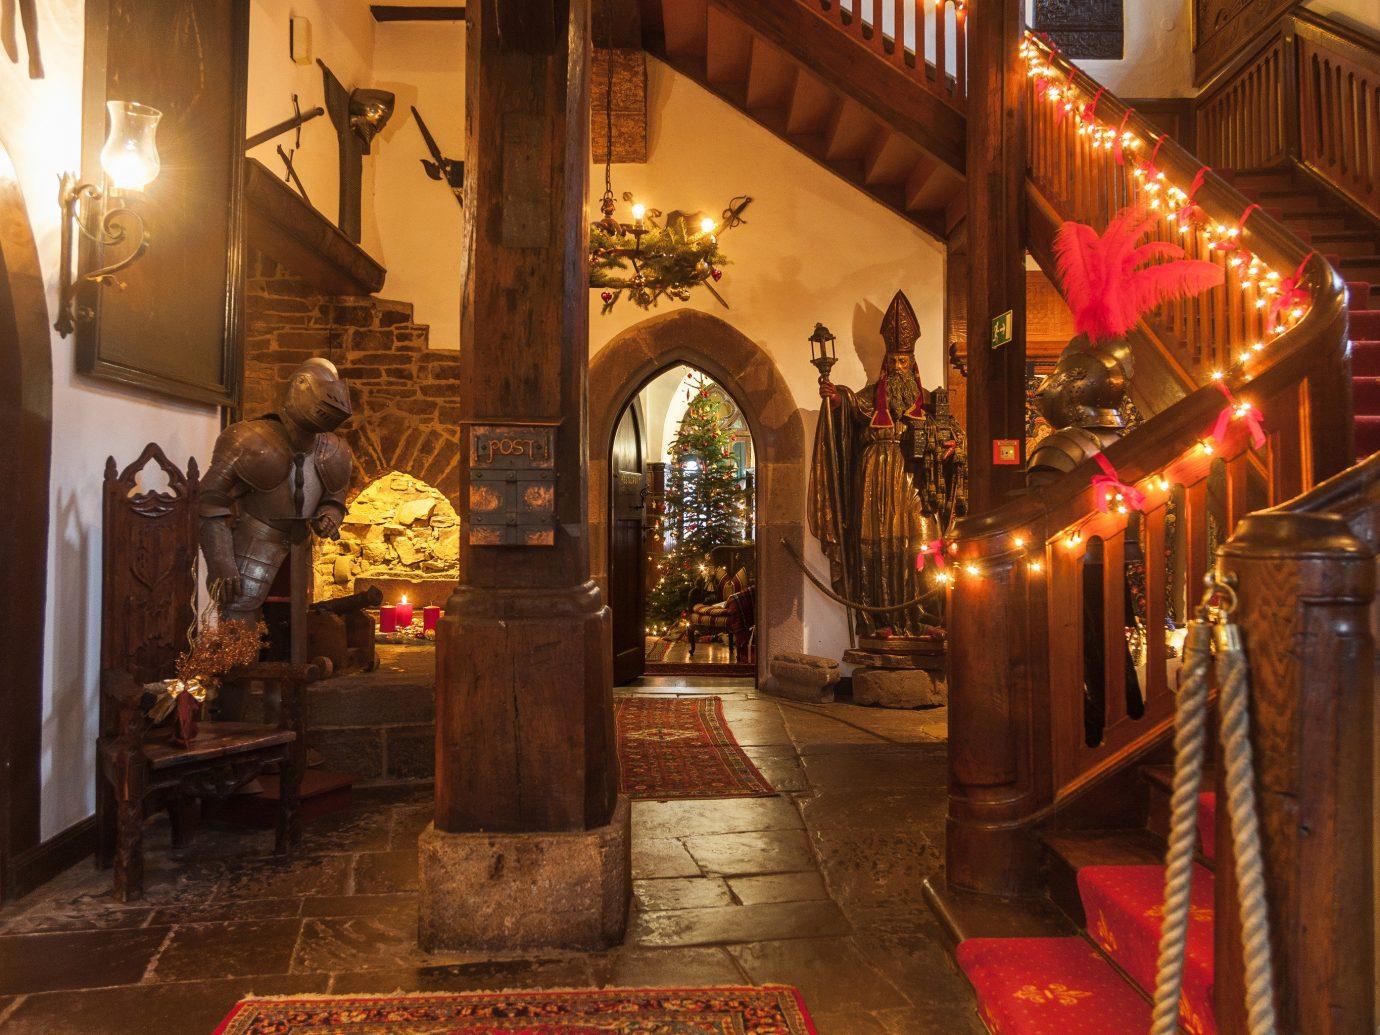 Hotels Landmarks Luxury Travel interior design wood window night Fireplace altar